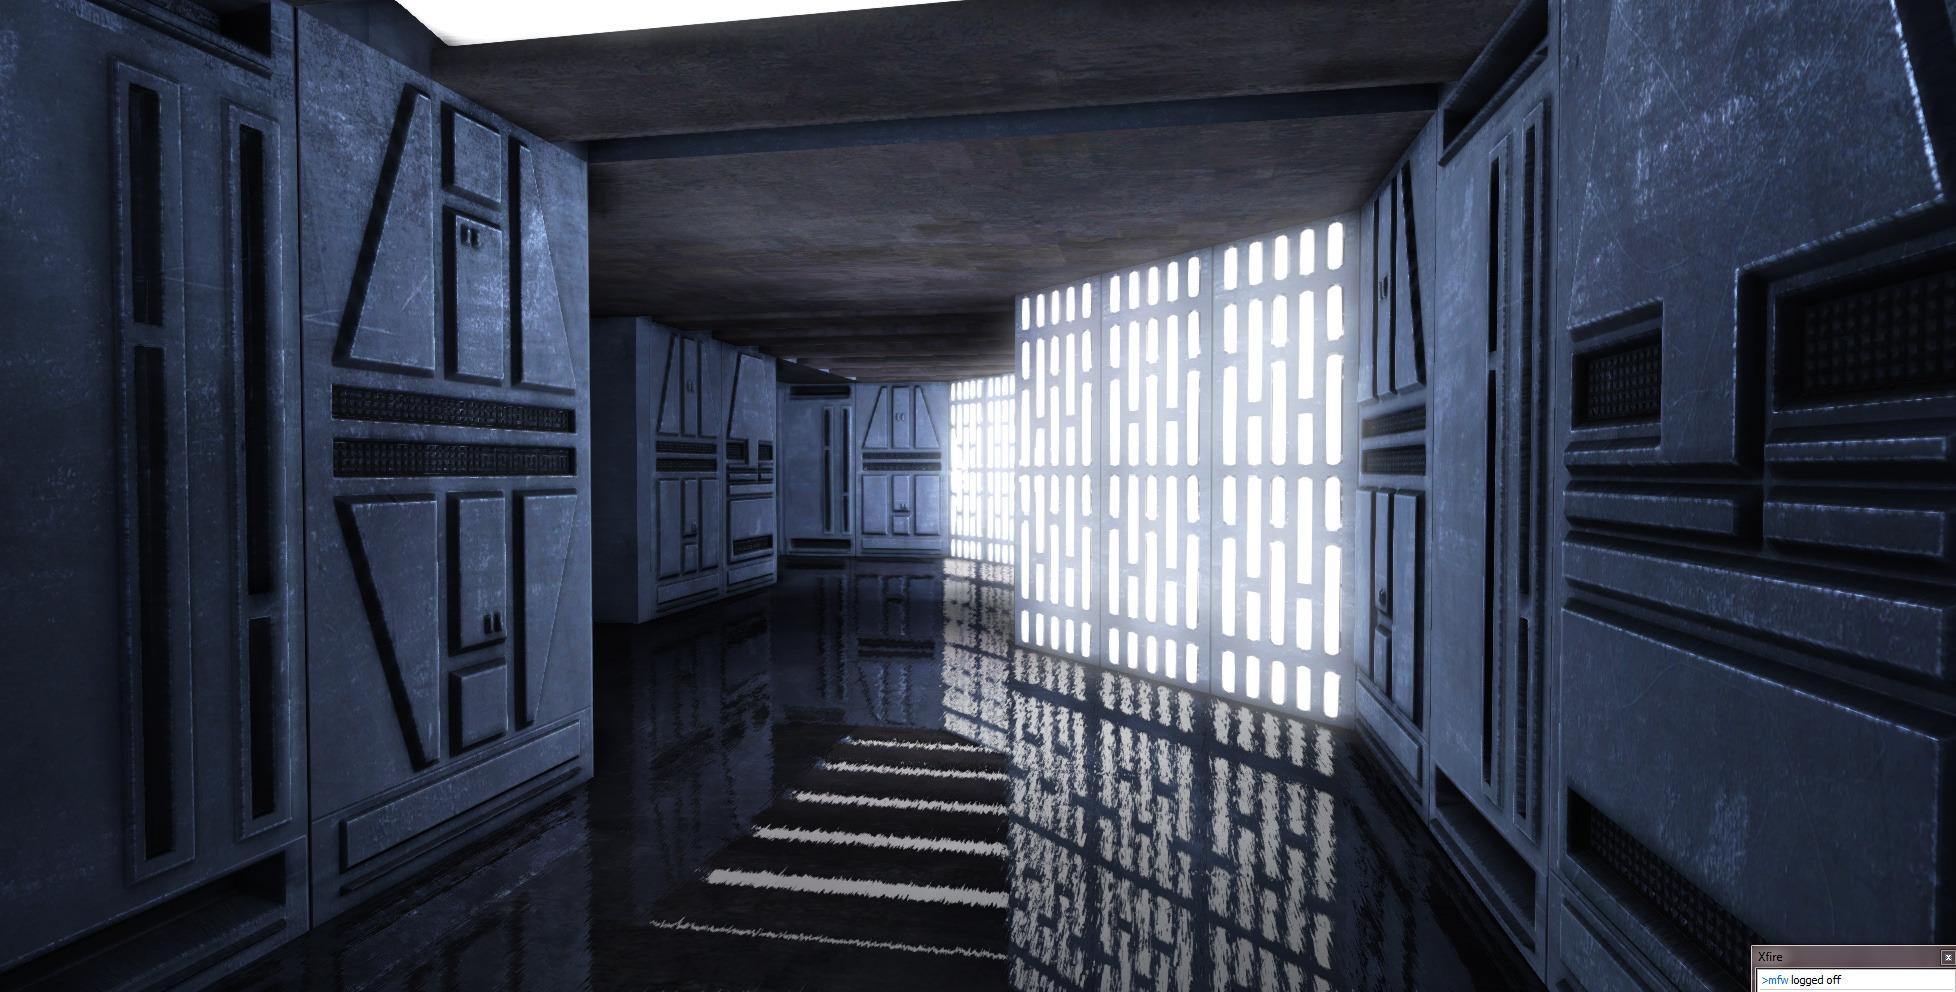 Wip Death Star Image Movie Battles Iii Mod Db